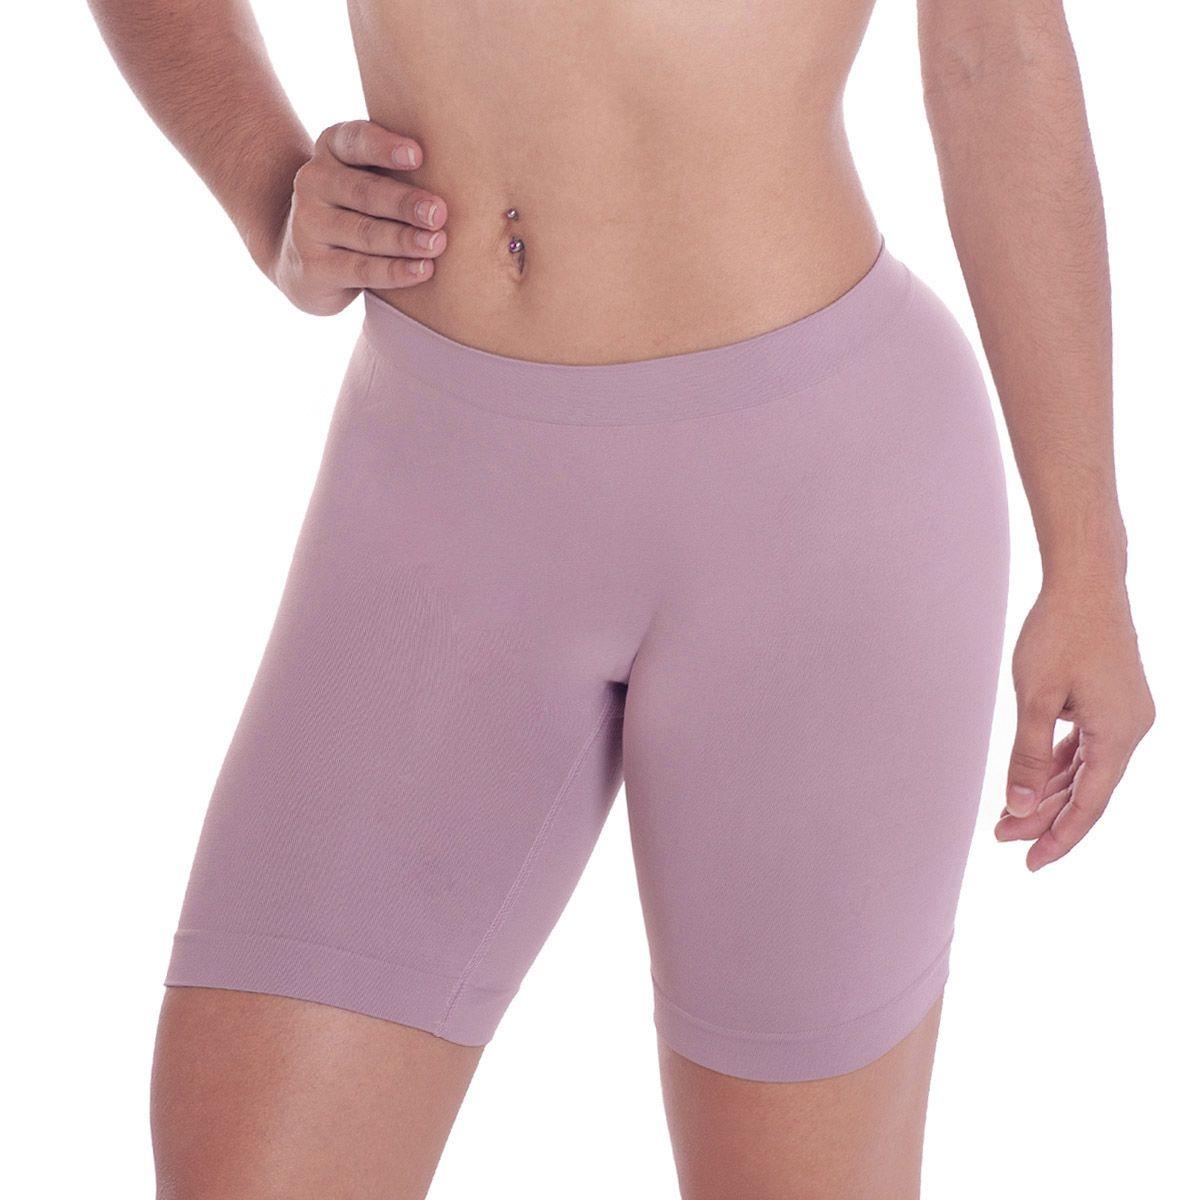 Calcinha shorts boxer sem costura moda intima feminina Loba Lupo